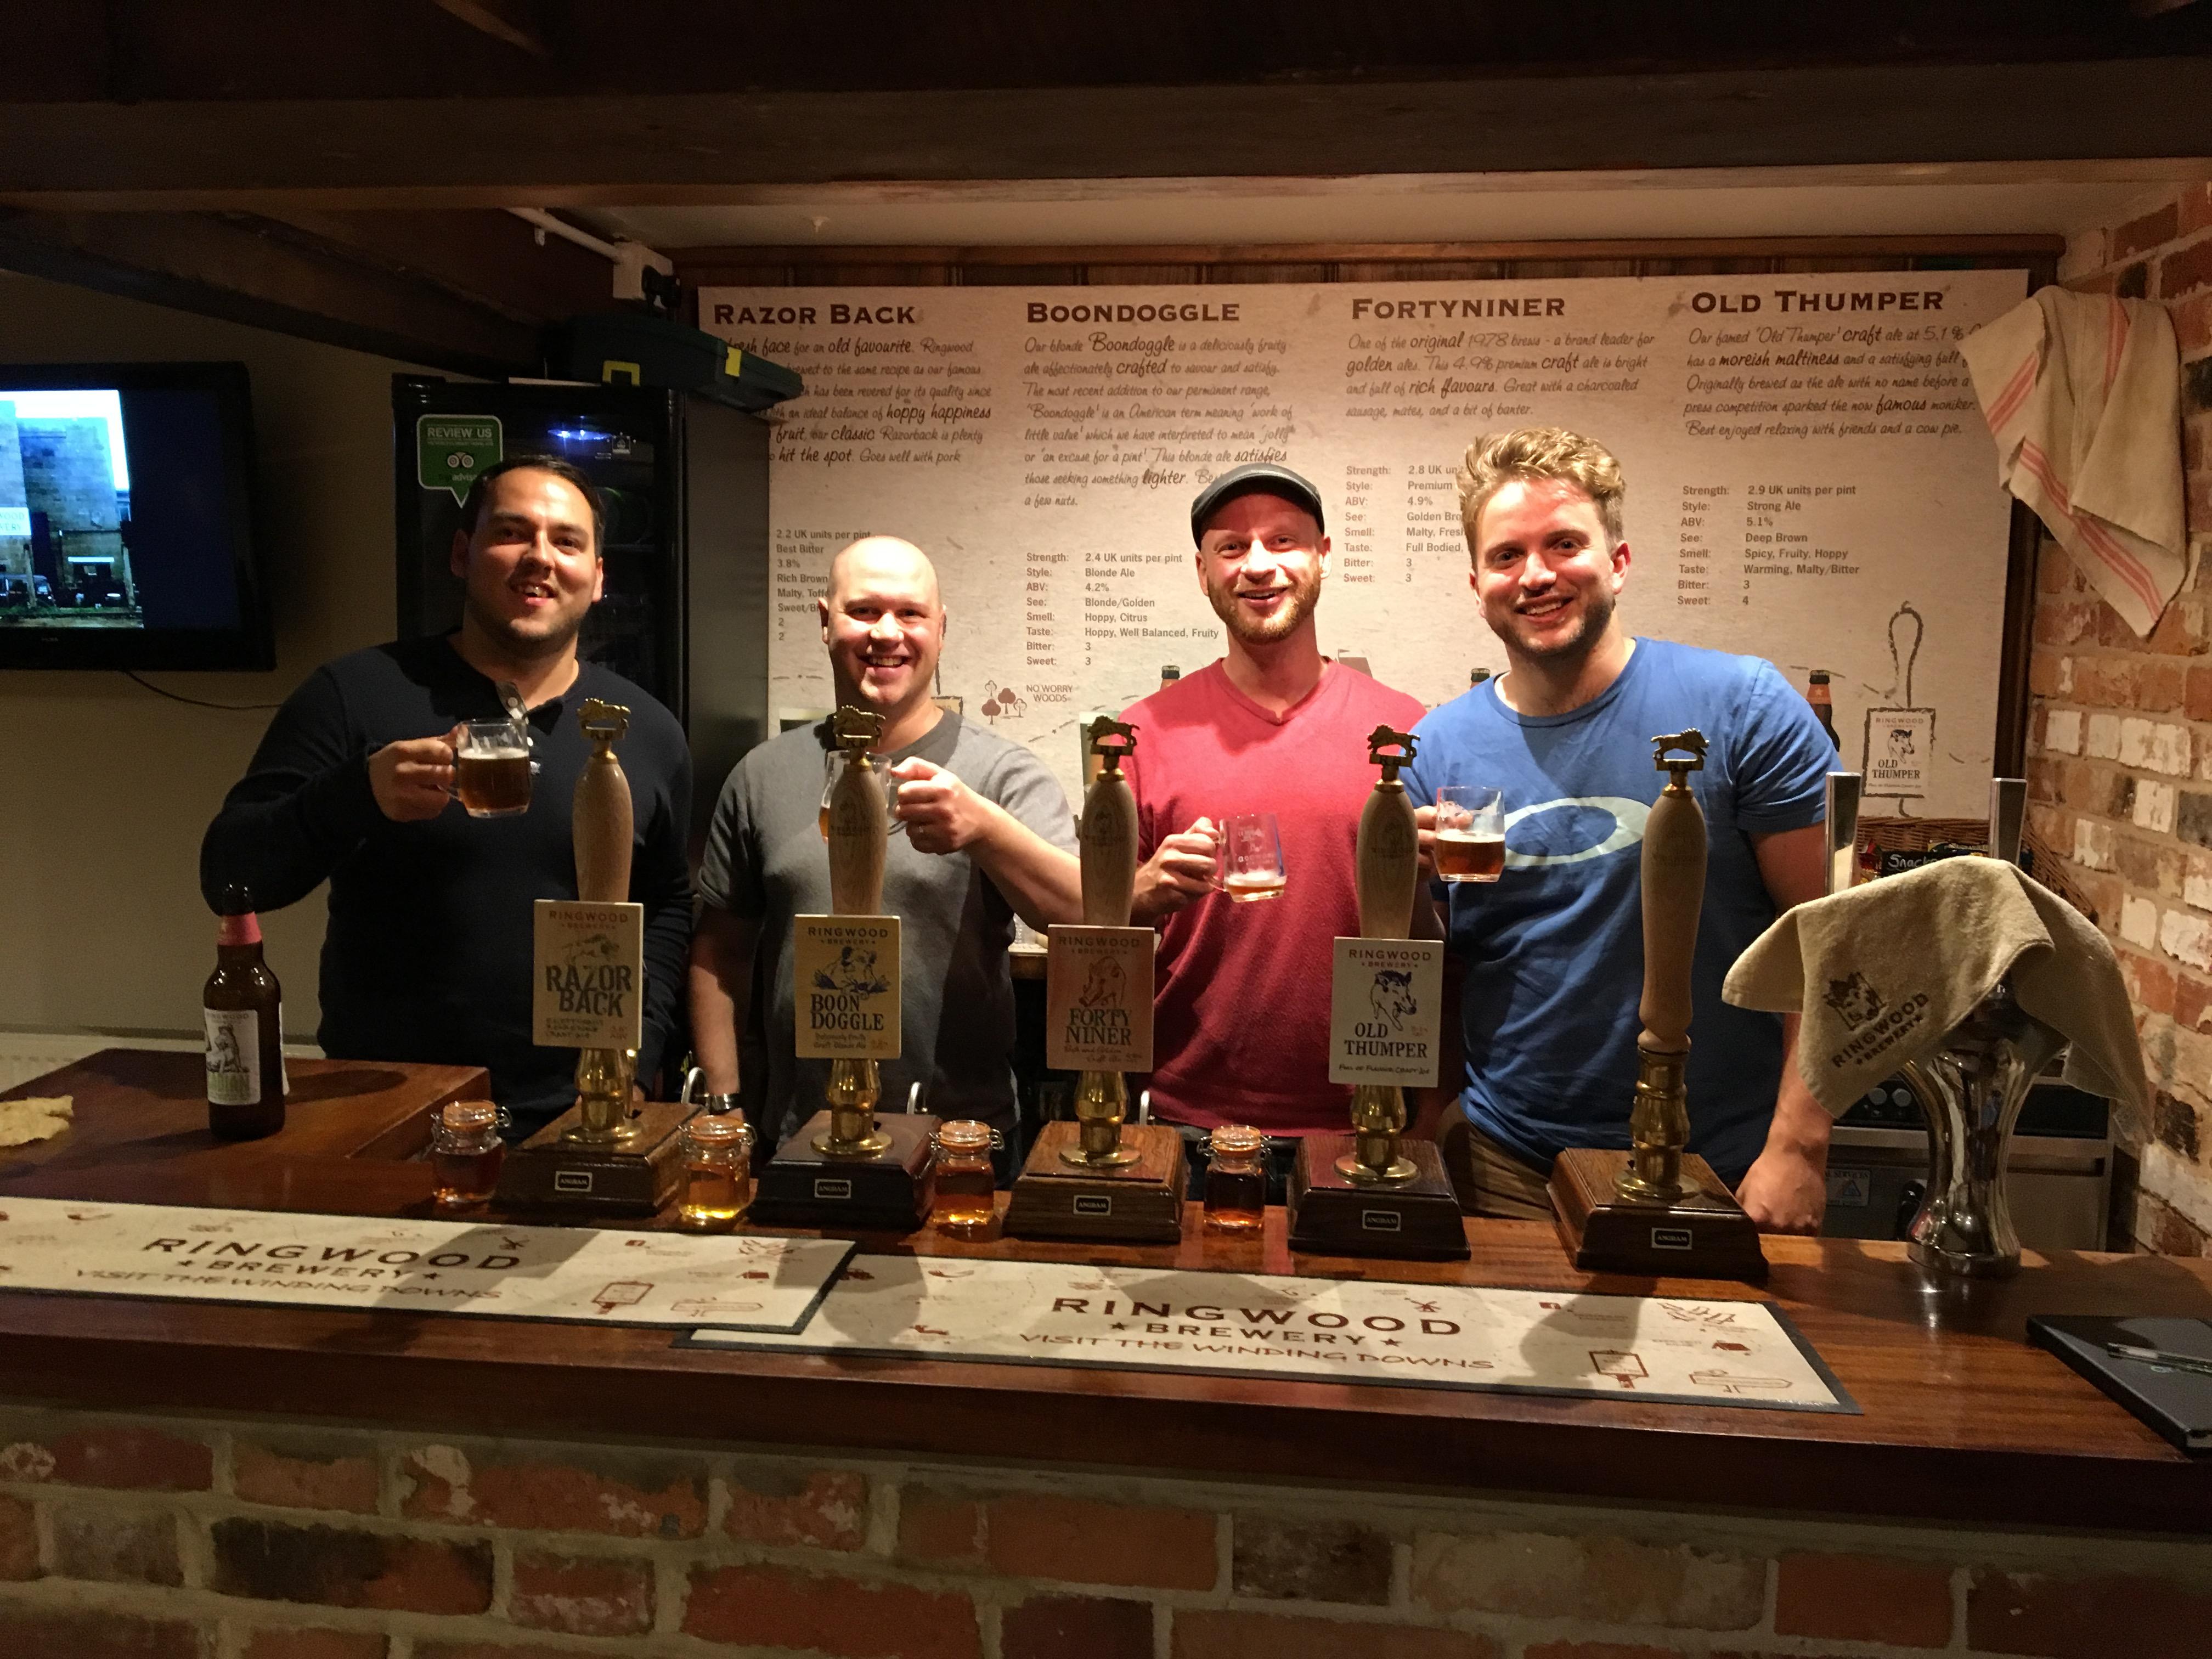 Review of Ringwood Breweryand their beers